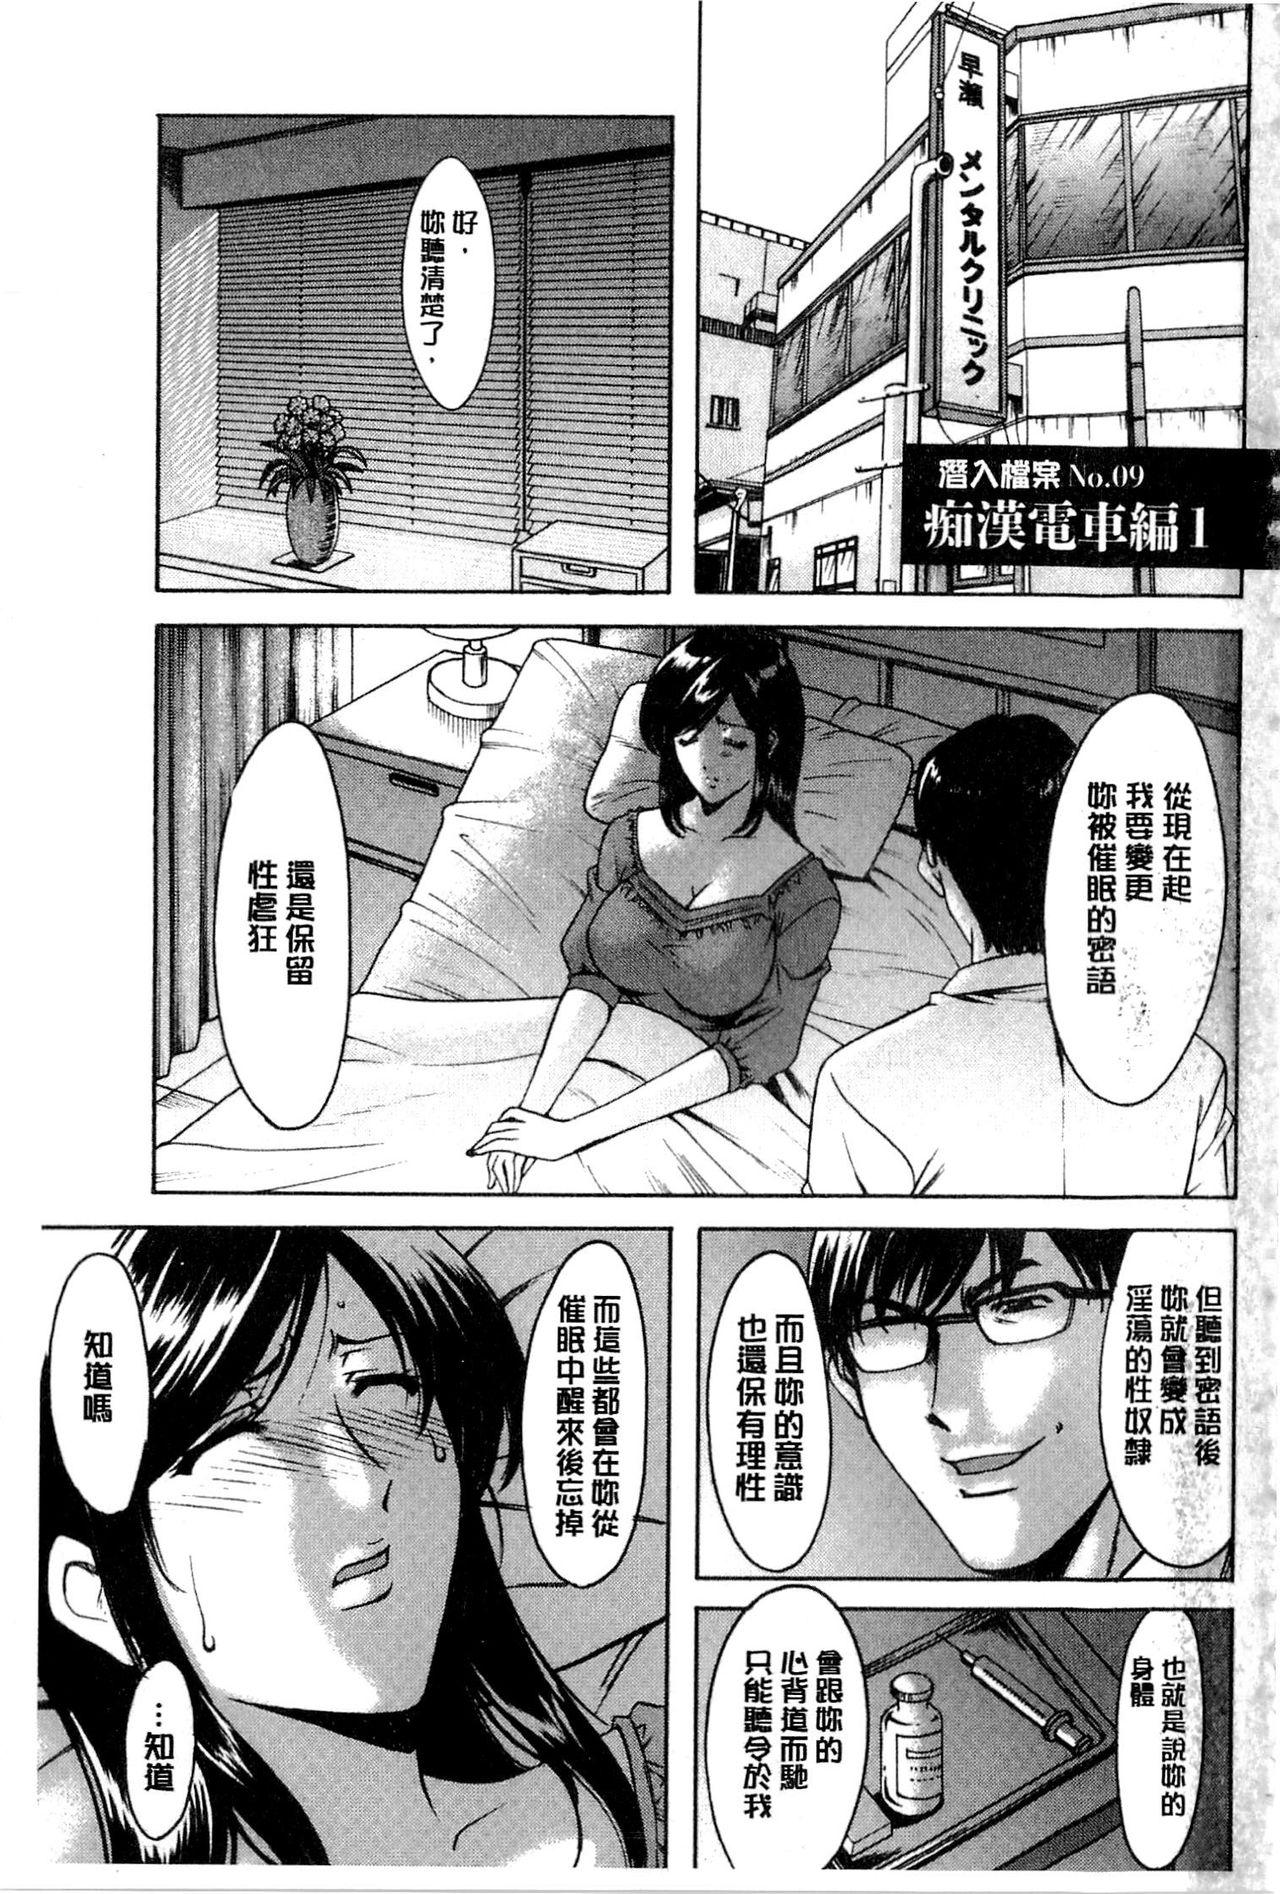 Sennyu Tsuma Satomi Kiroku   臥底人妻里美 洗腦凌辱的記錄 下集 3